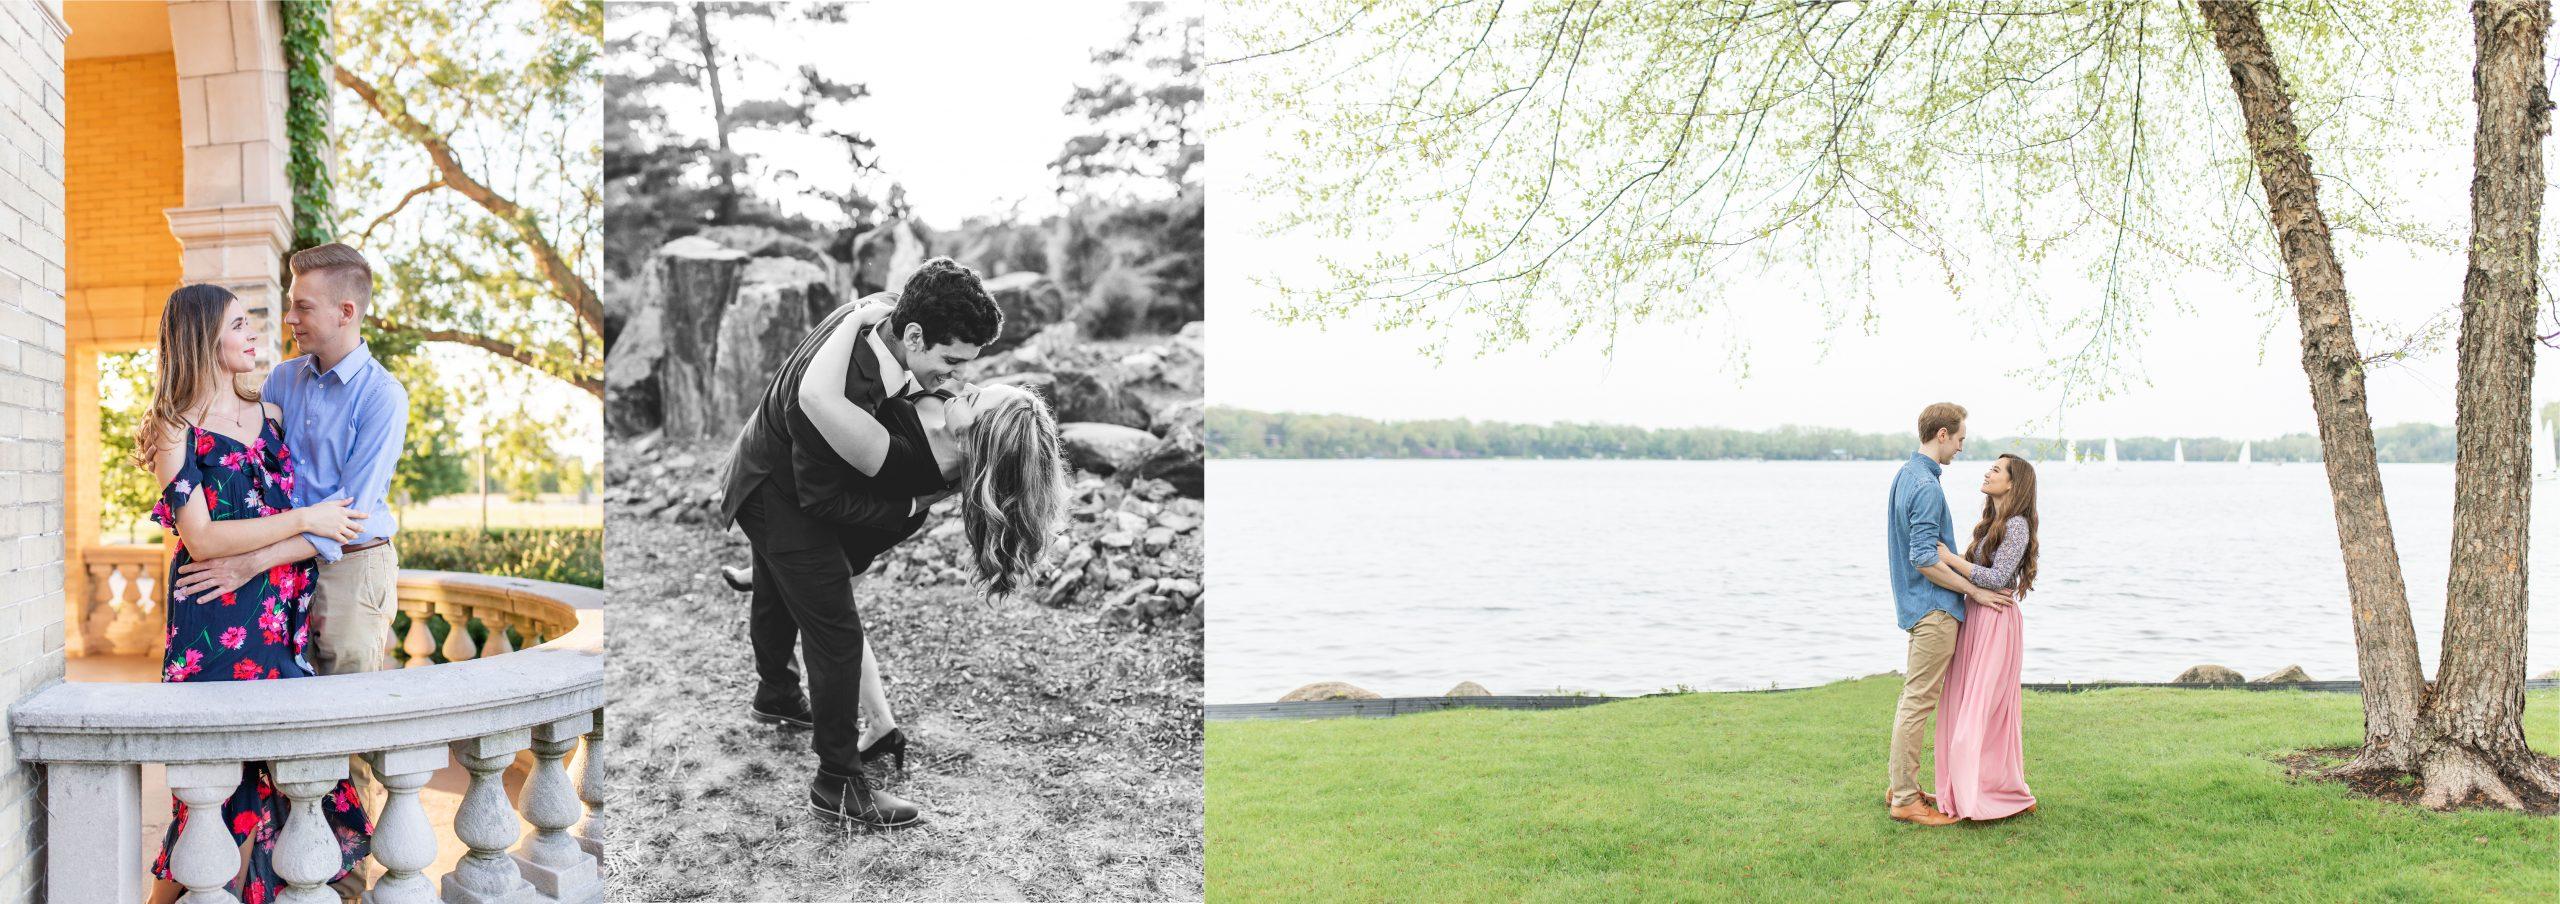 kandra-lynn-photography-wedding-photographer-10